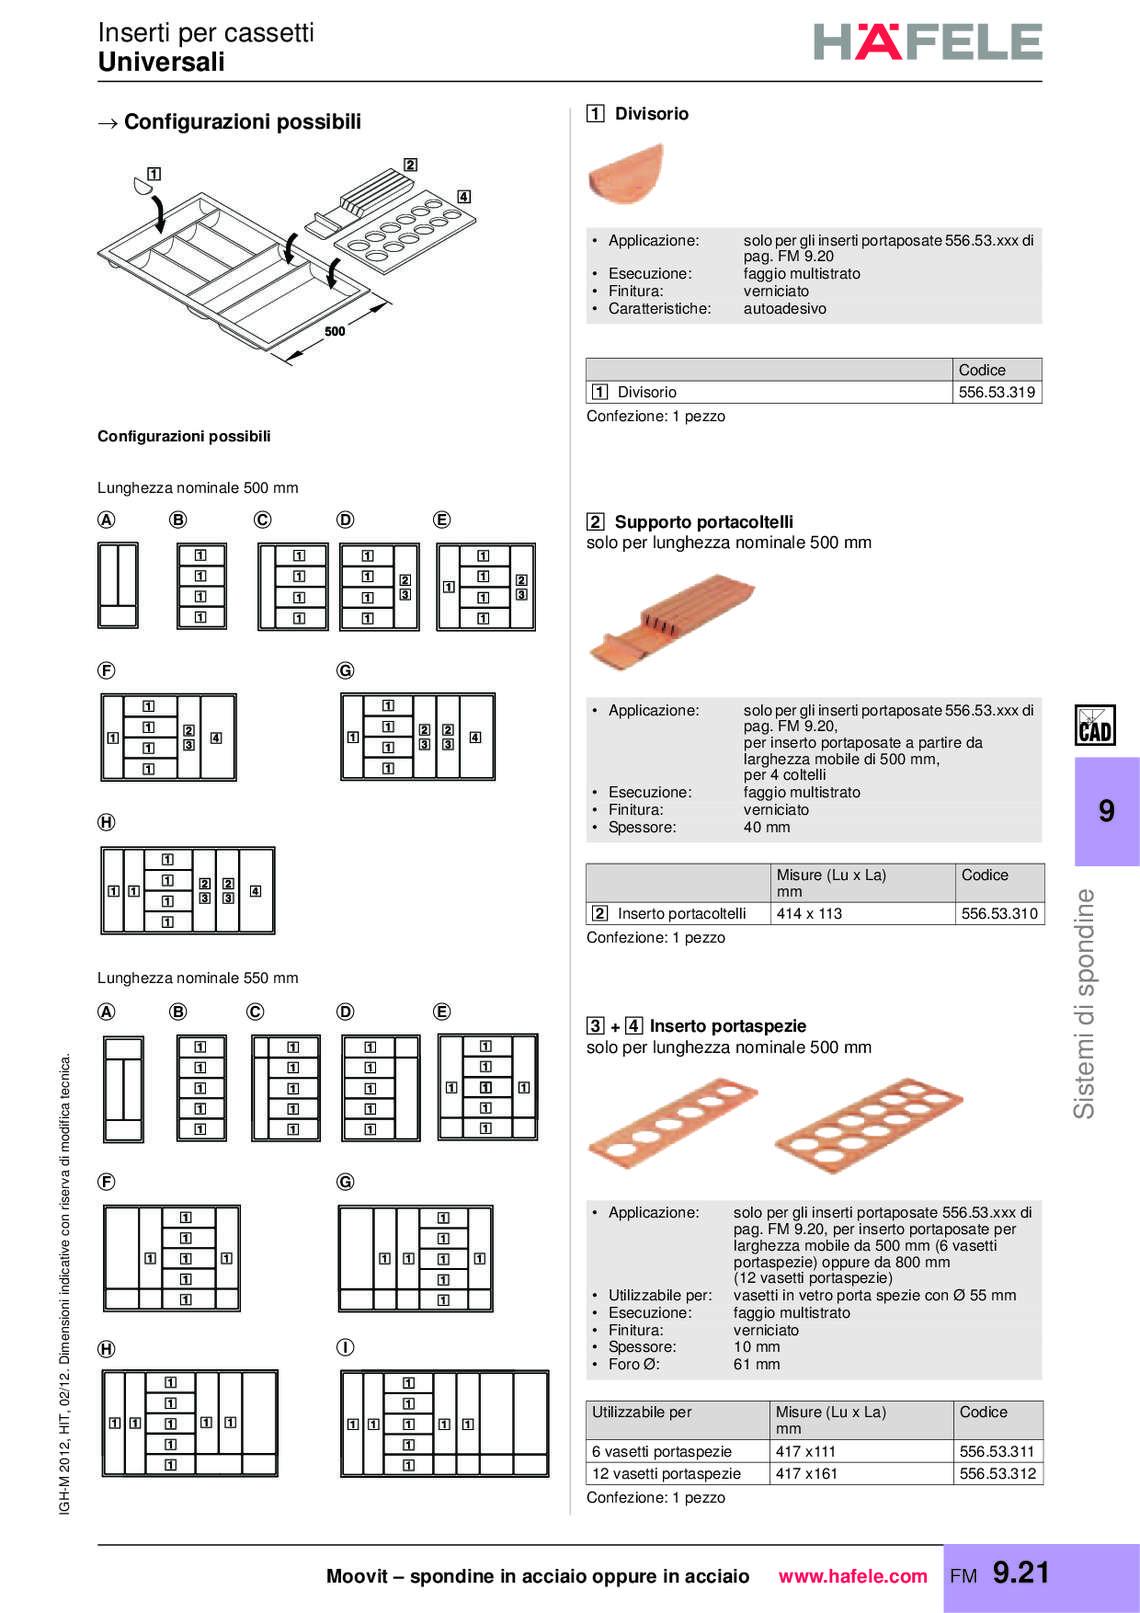 hafele-spondine-e-guide-per-mobili_40_034.jpg